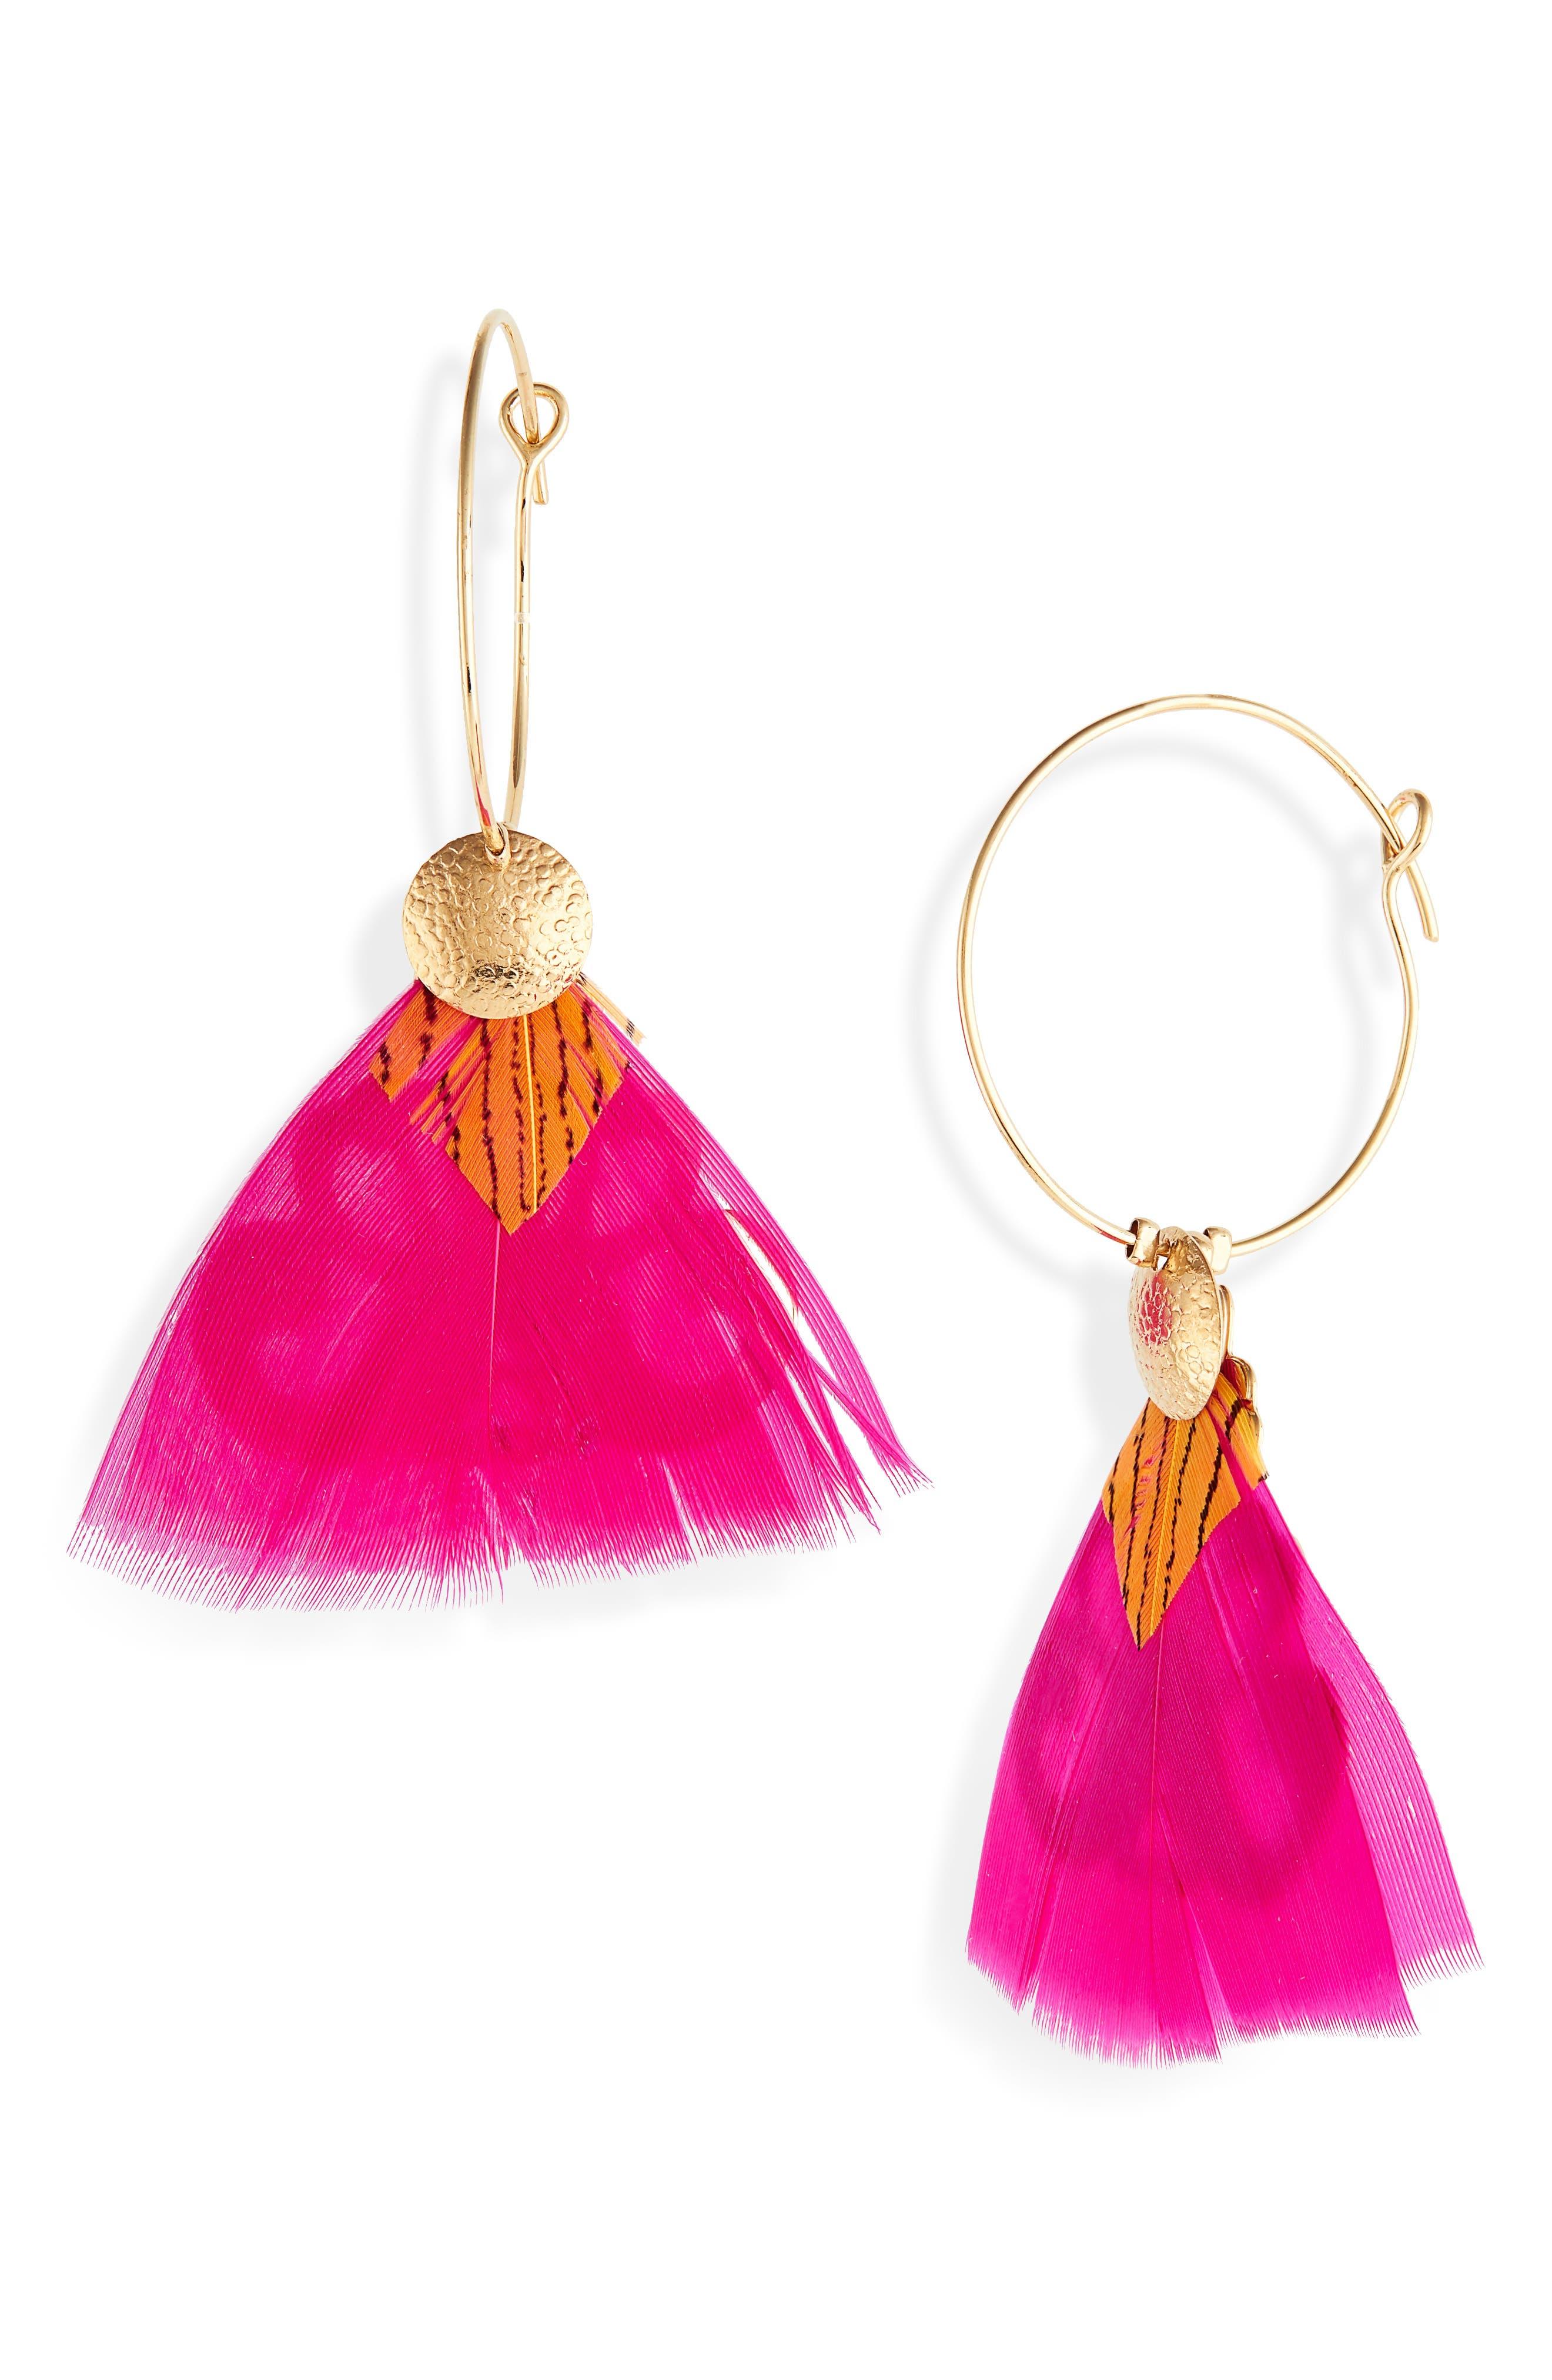 GAS BIJOUX Bermude Feather Hoop Earrings in Pink